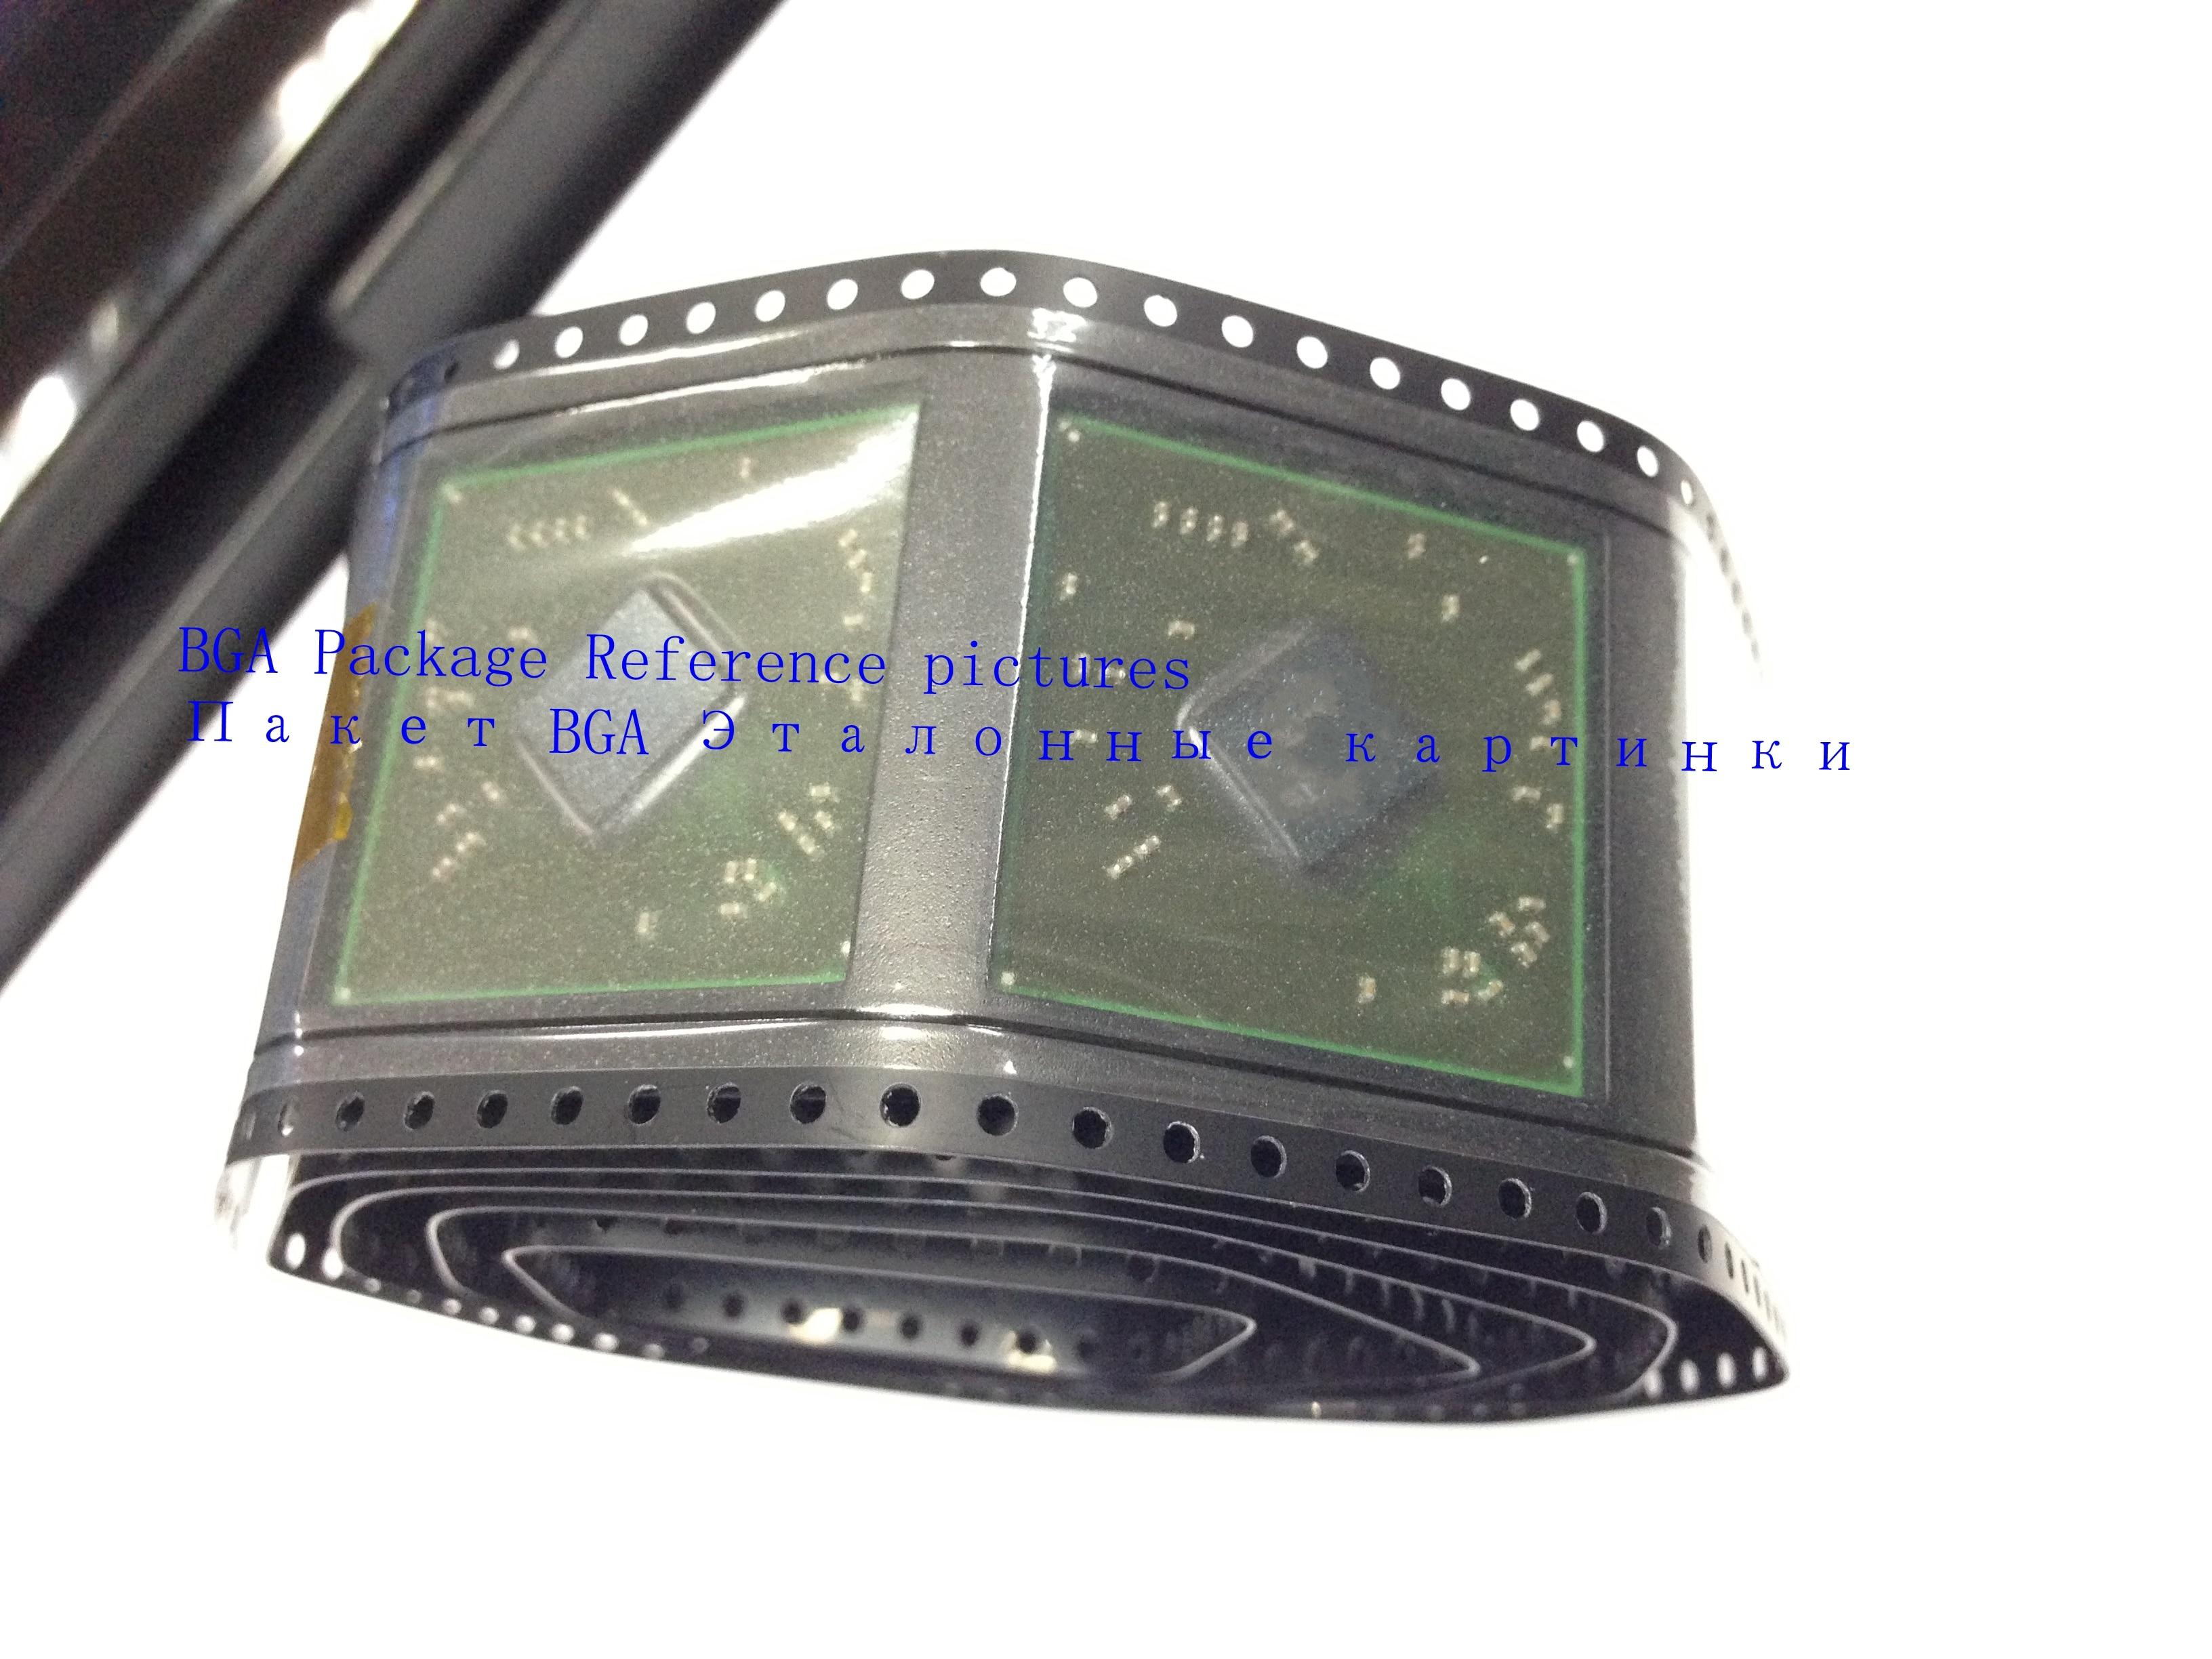 1pcs/lot 100% New N14E-GL-A1 N14E GL A1 BGA Chipset1pcs/lot 100% New N14E-GL-A1 N14E GL A1 BGA Chipset